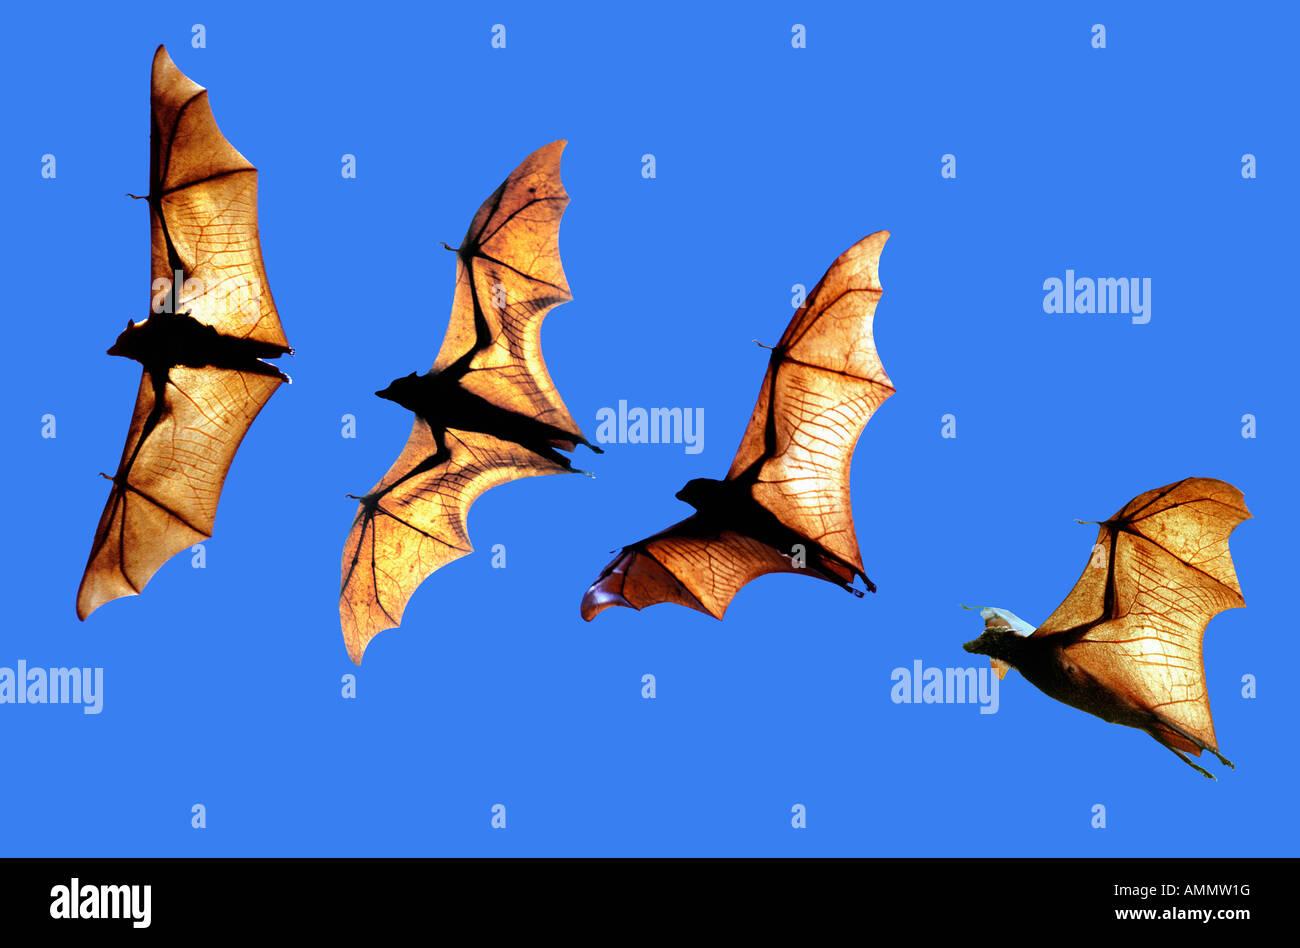 Roussette d Indonesie Pteropus Vampyrus große Flughunde Borneo Indonesien Asien Indonesien erwachsenen Tier Stockbild